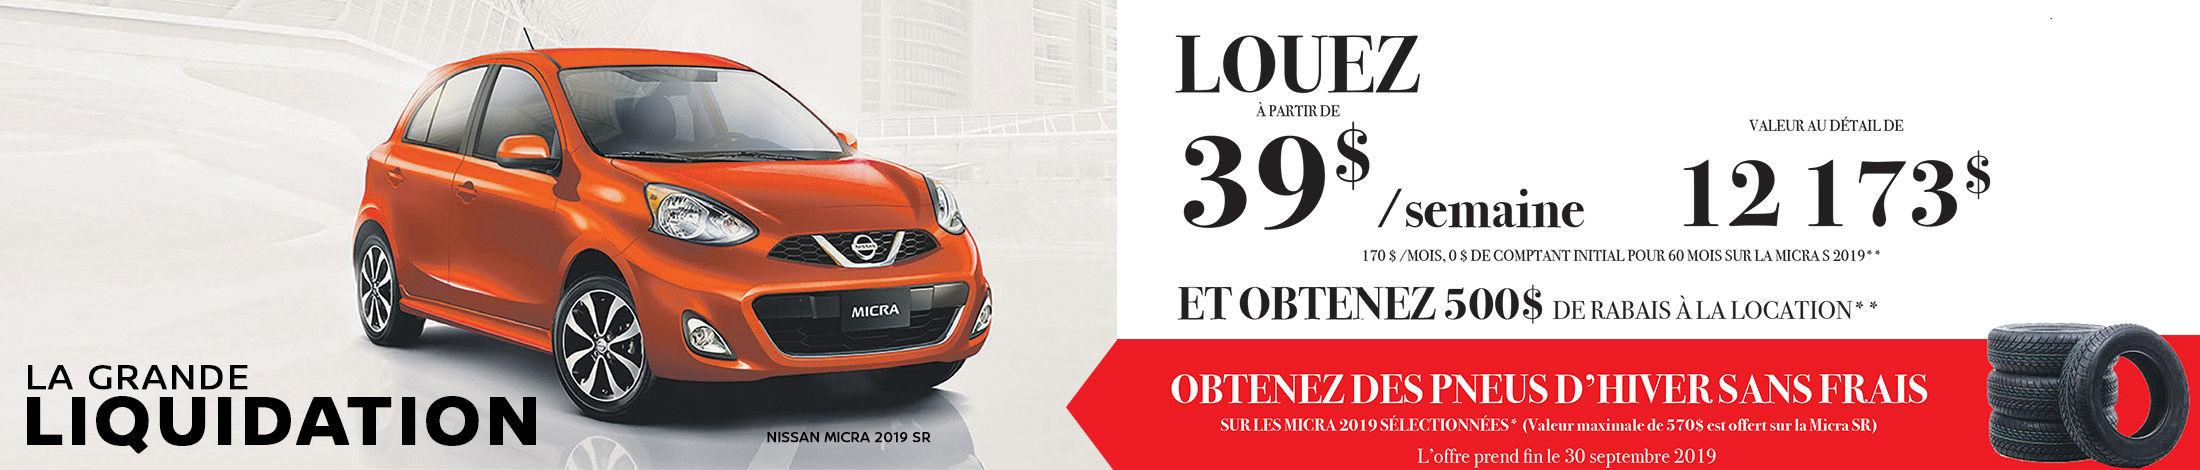 La Grande Liquidation Nissan Micra 2019